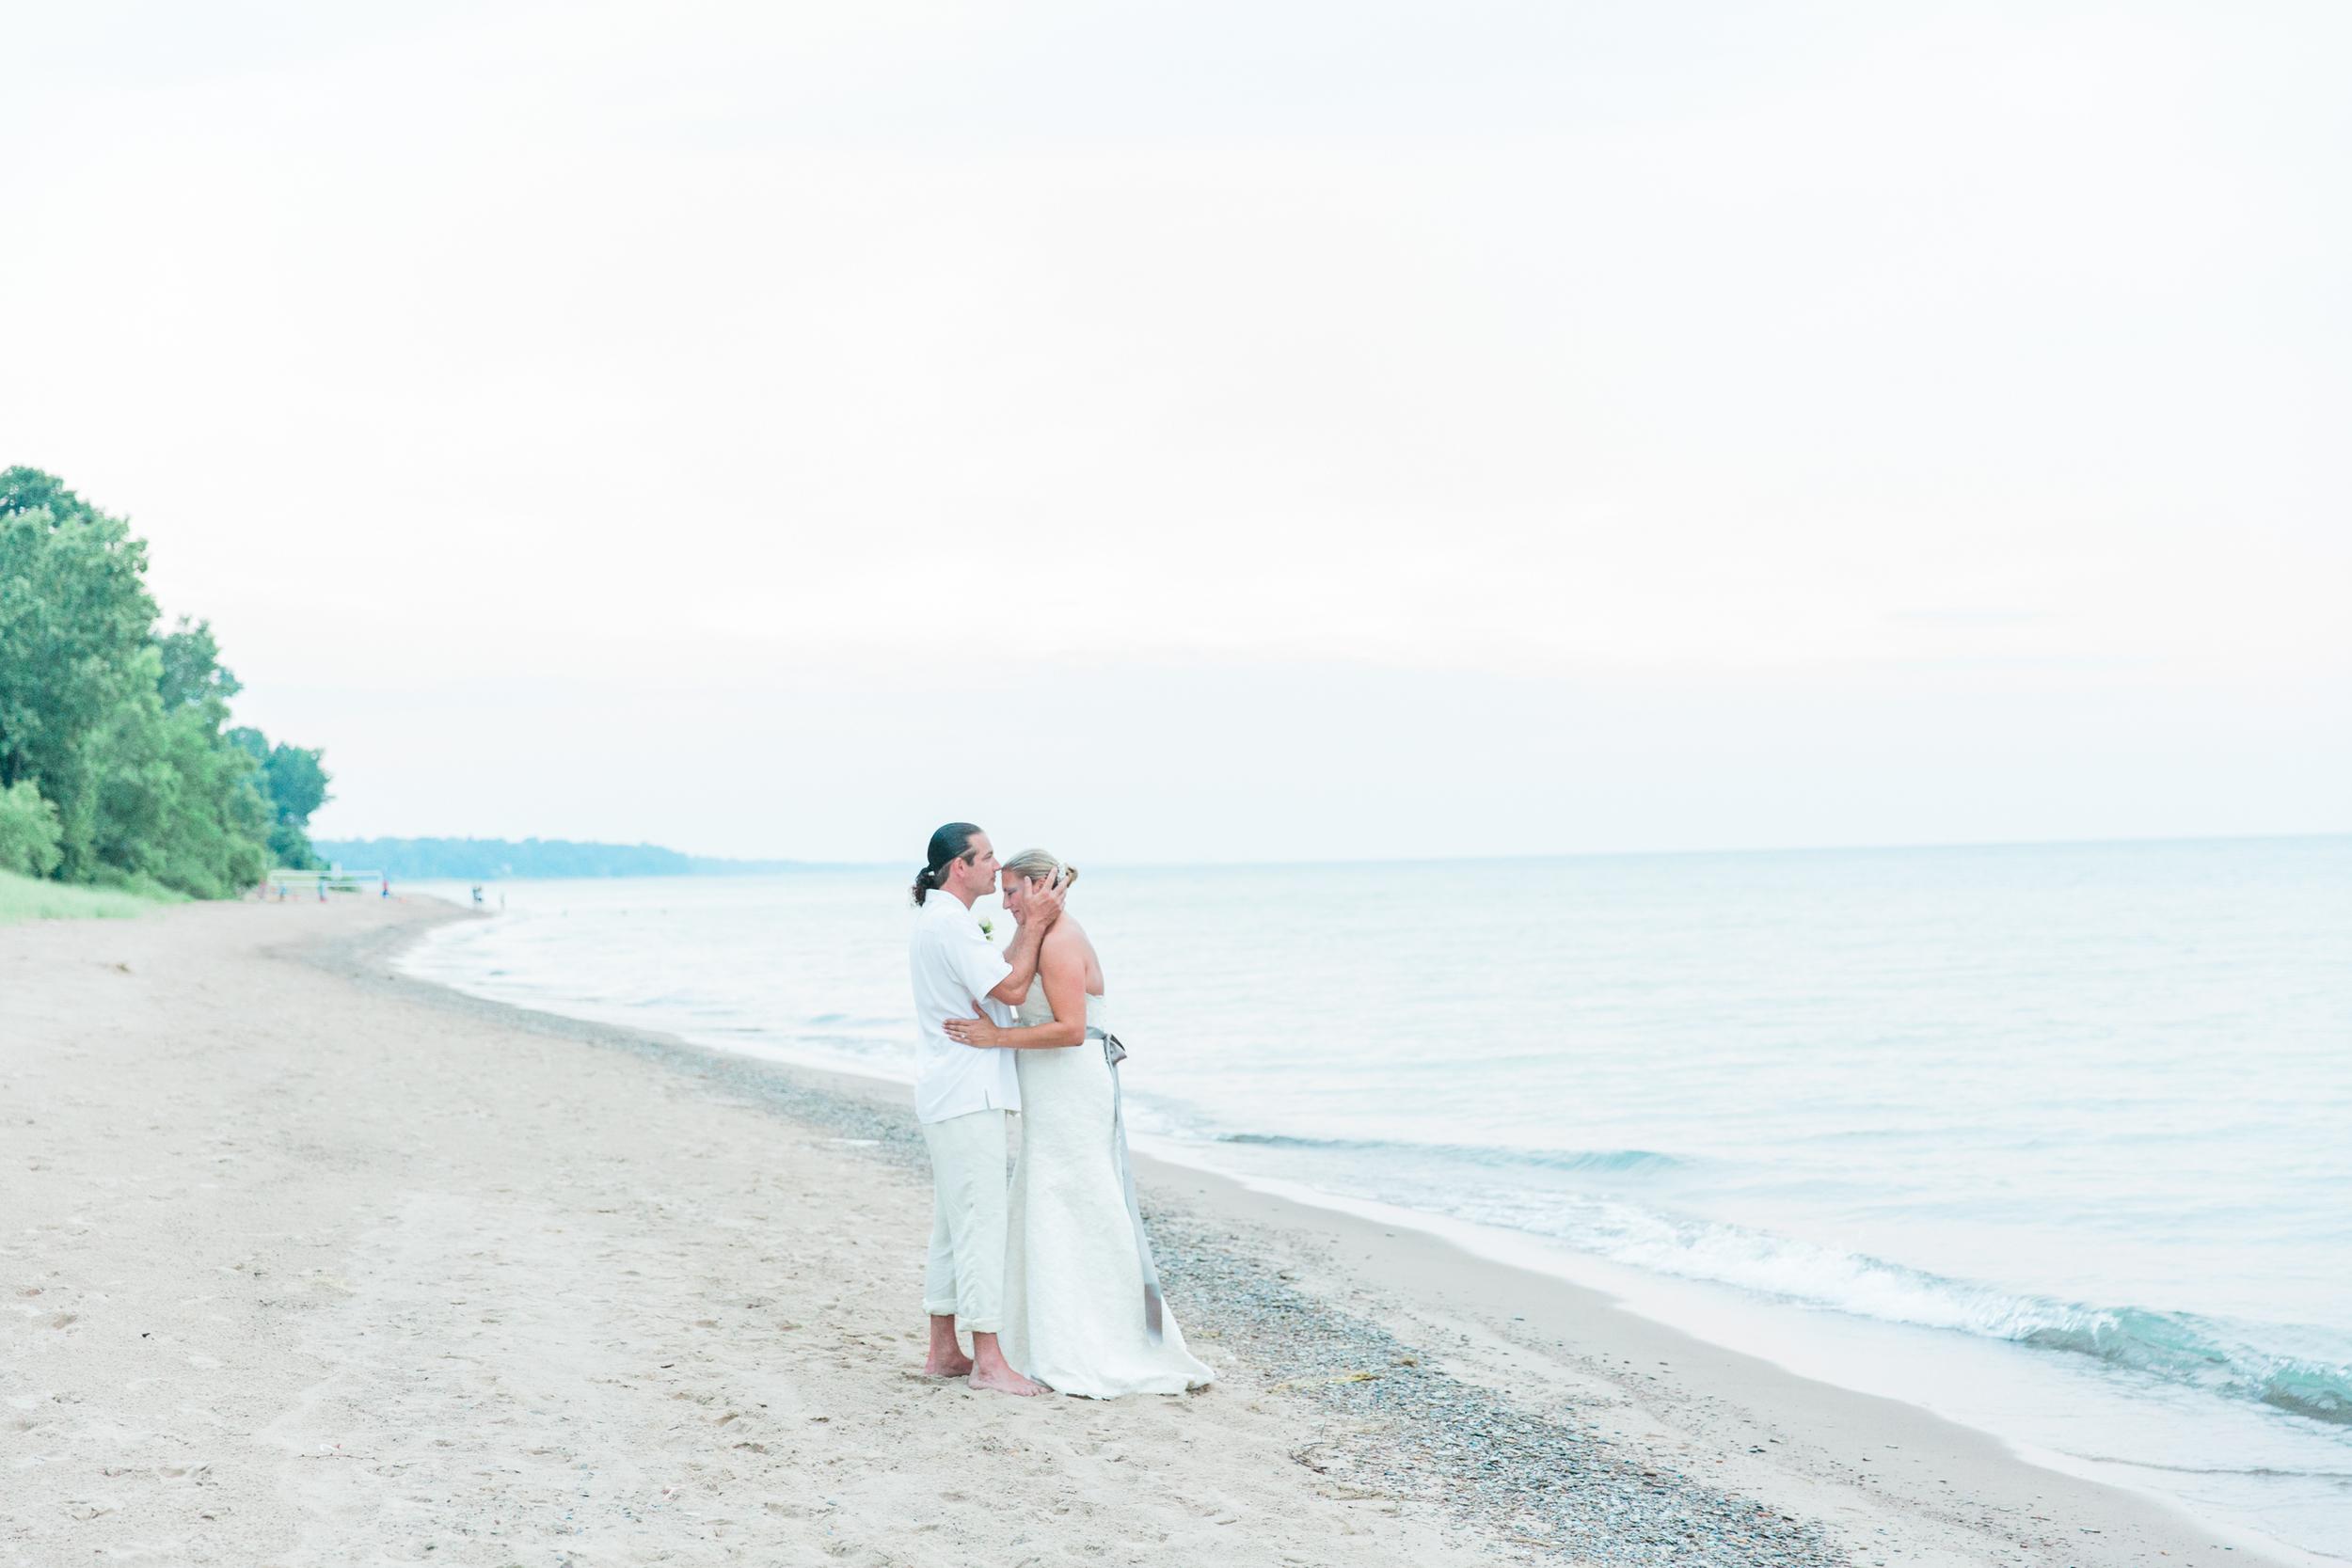 Bonphotage Lake Michigan Wedding Photography